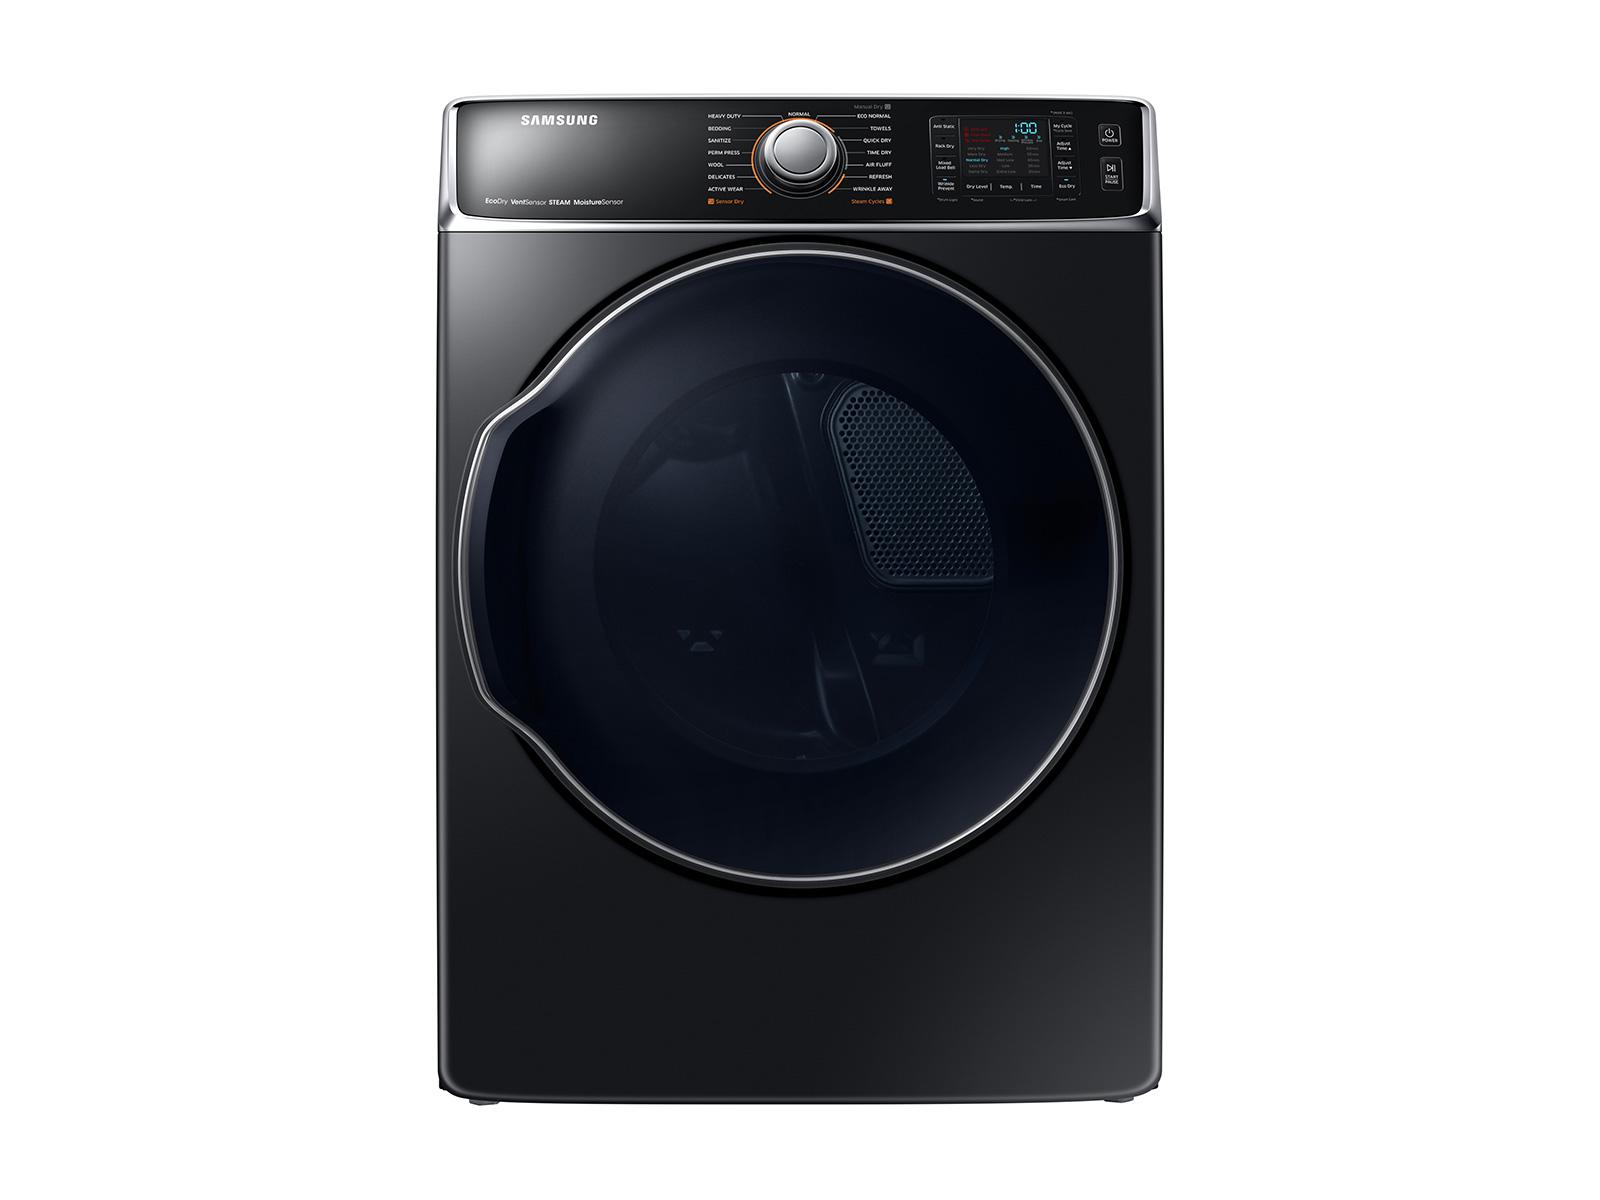 Samsung 9.5 cu. ft. Electric Dryer in Black Stainless Steel , Fingerprint Resistant Black Stainless Steel